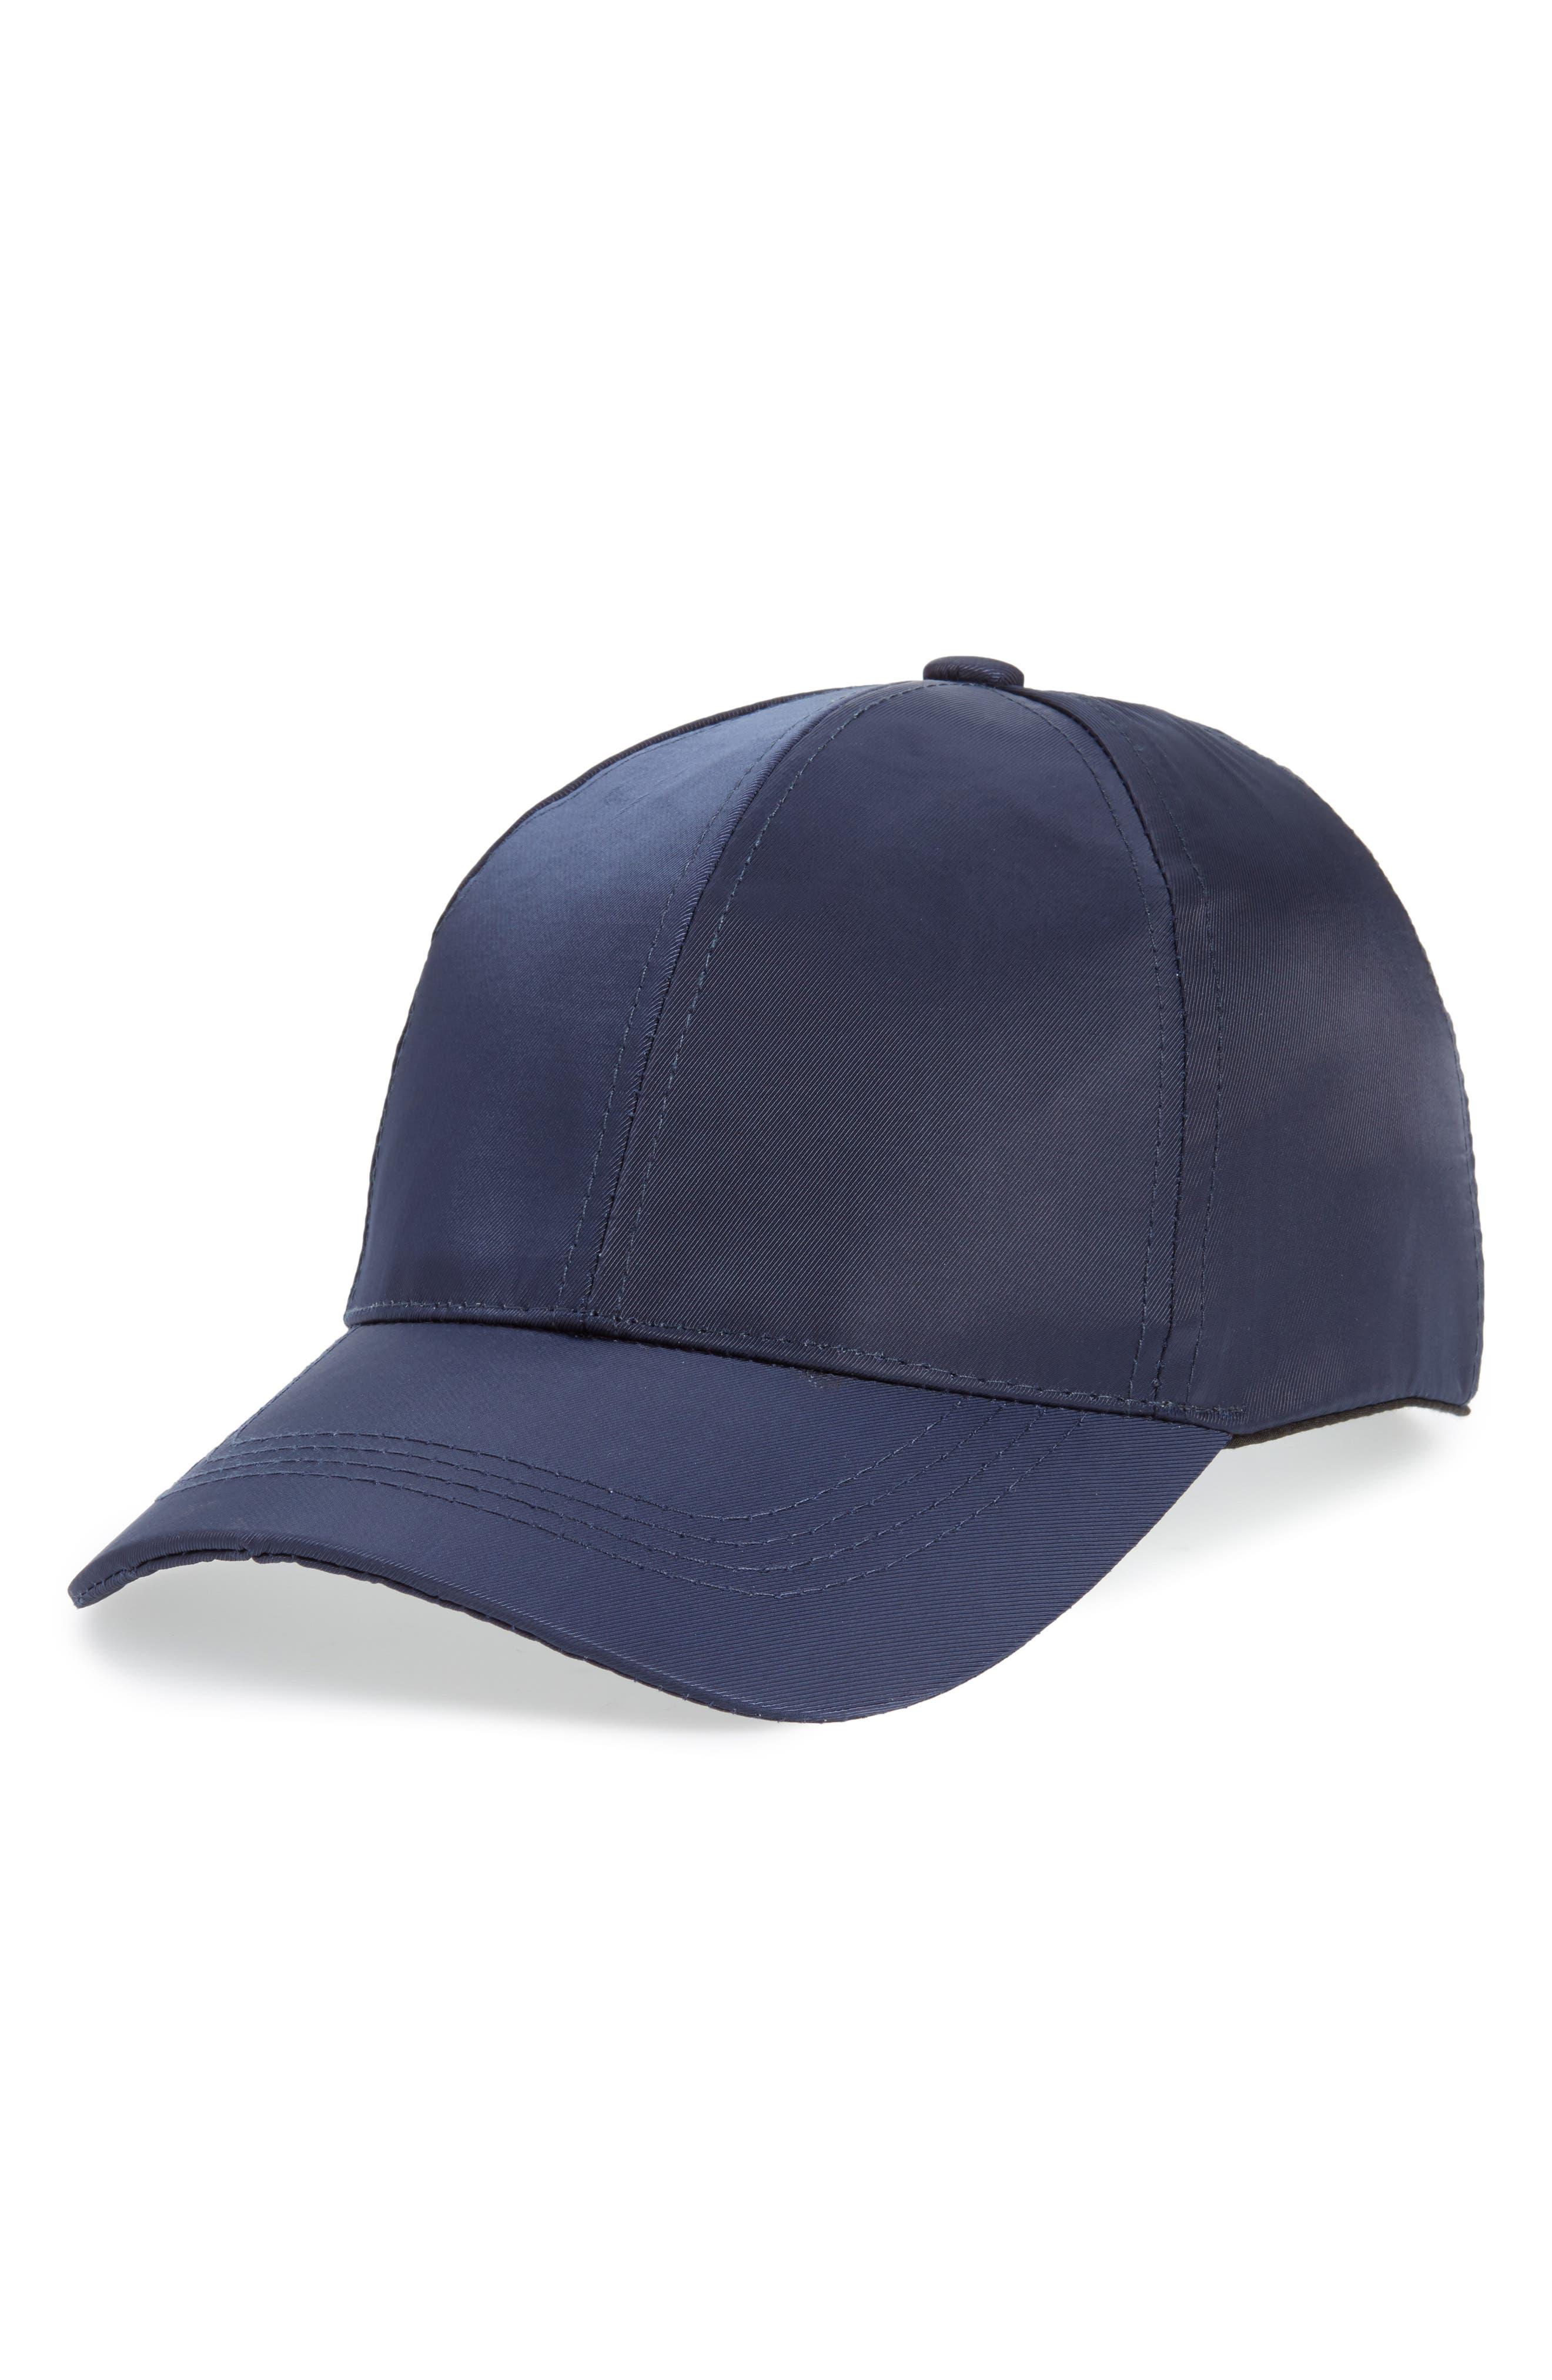 Water Repellent Baseball Hat,                             Main thumbnail 1, color,                             Blue Insignia